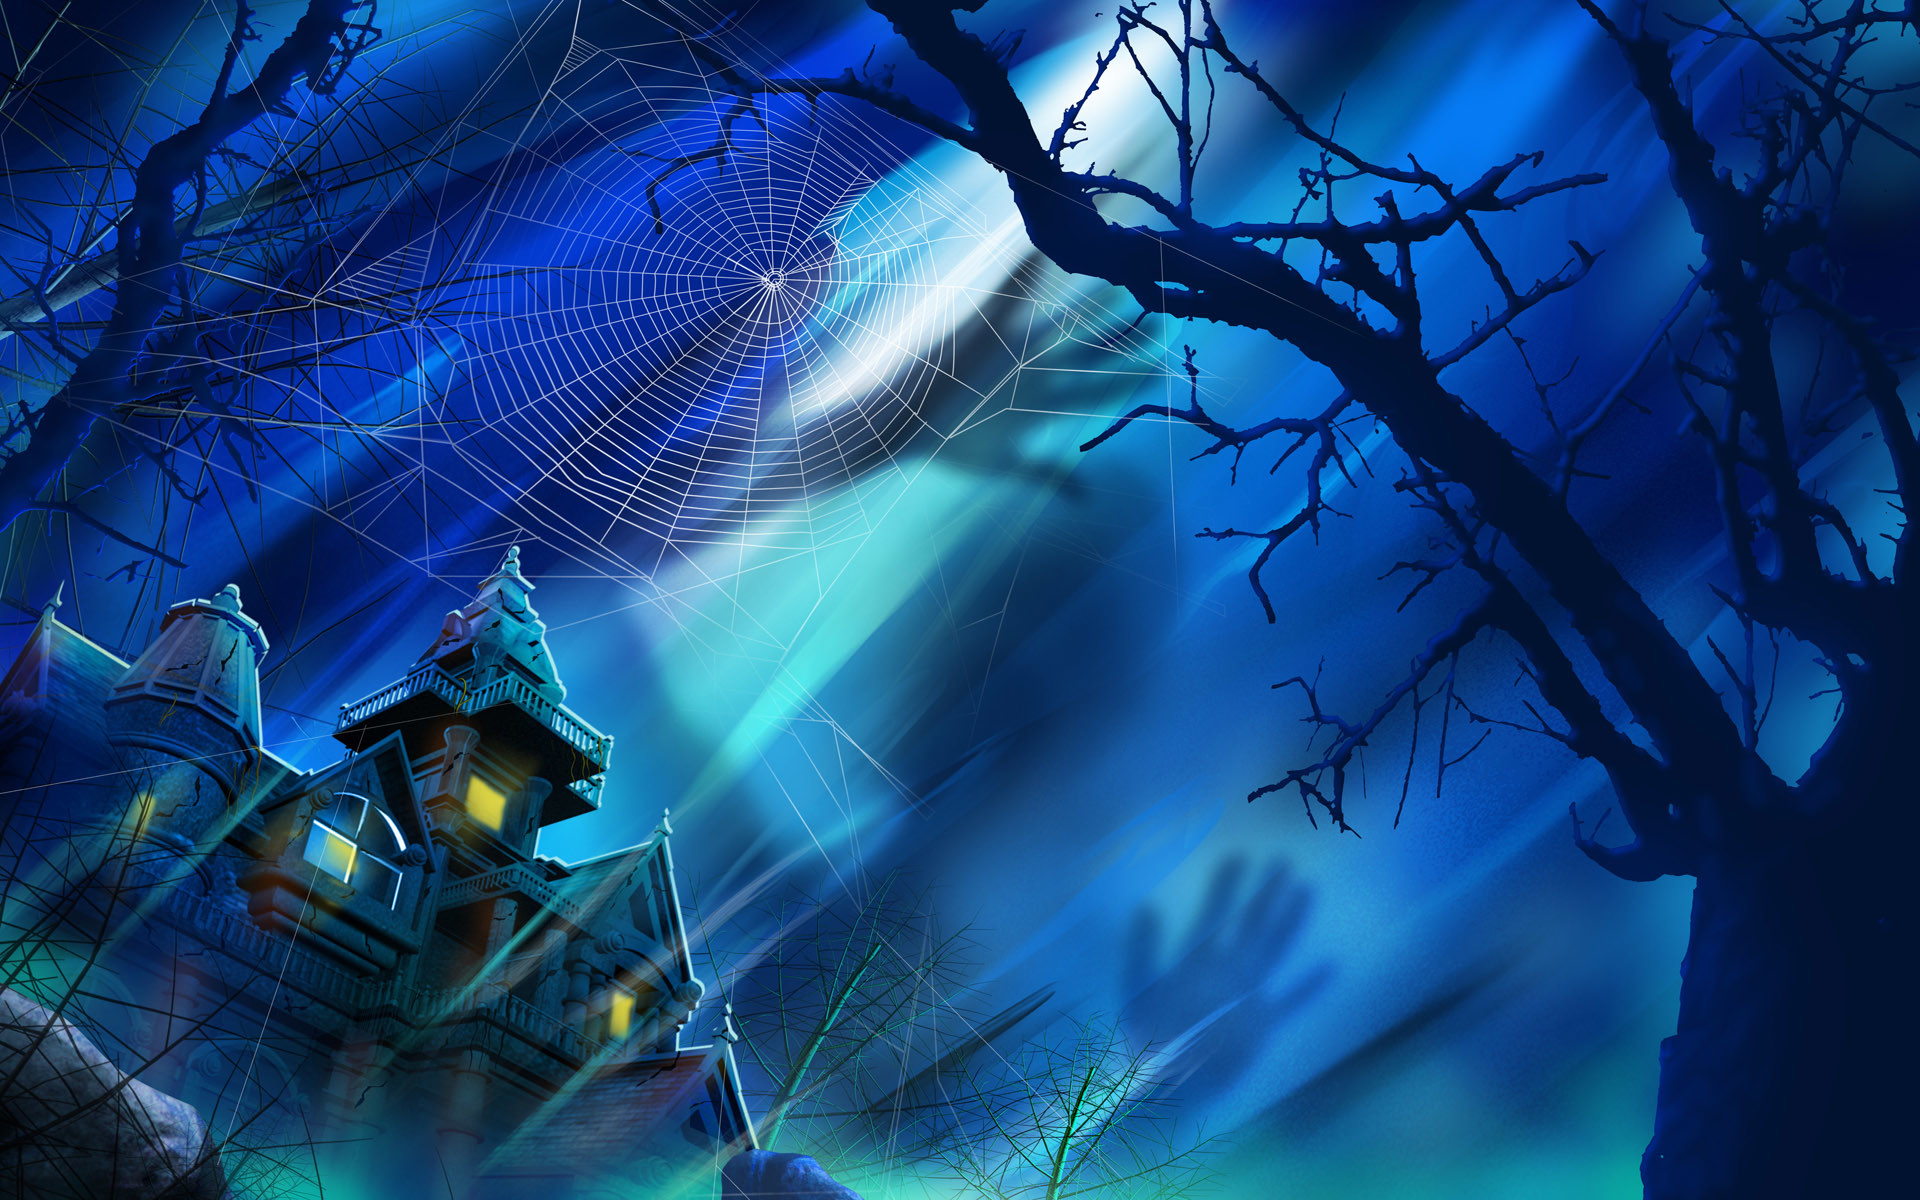 wallpapers, screen, savers, halloween, haunted, screensavers, mansion